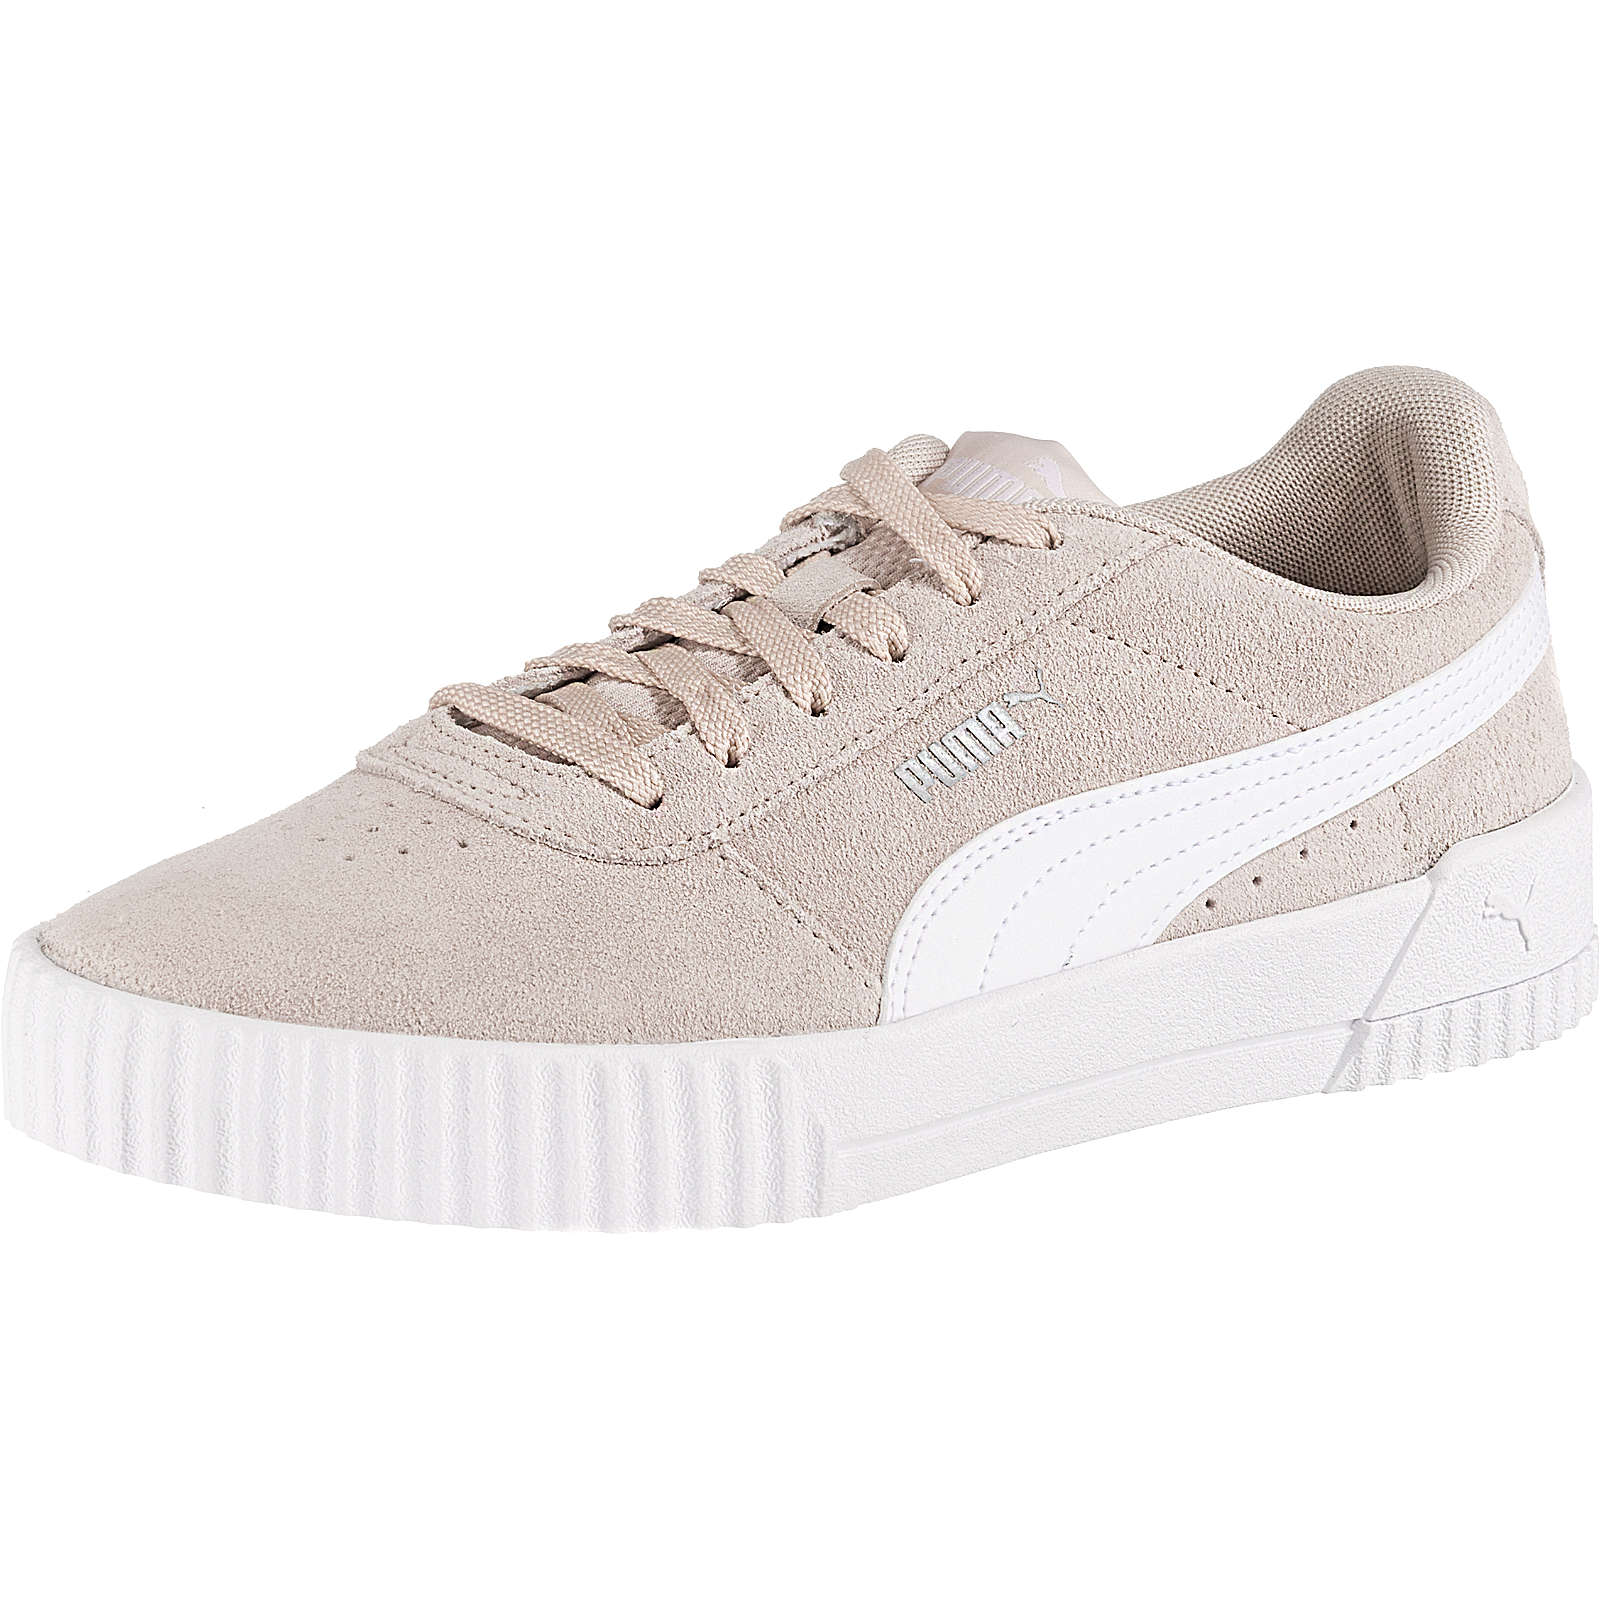 PUMA Carina Sneakers Low taupe Damen Gr. 42,5